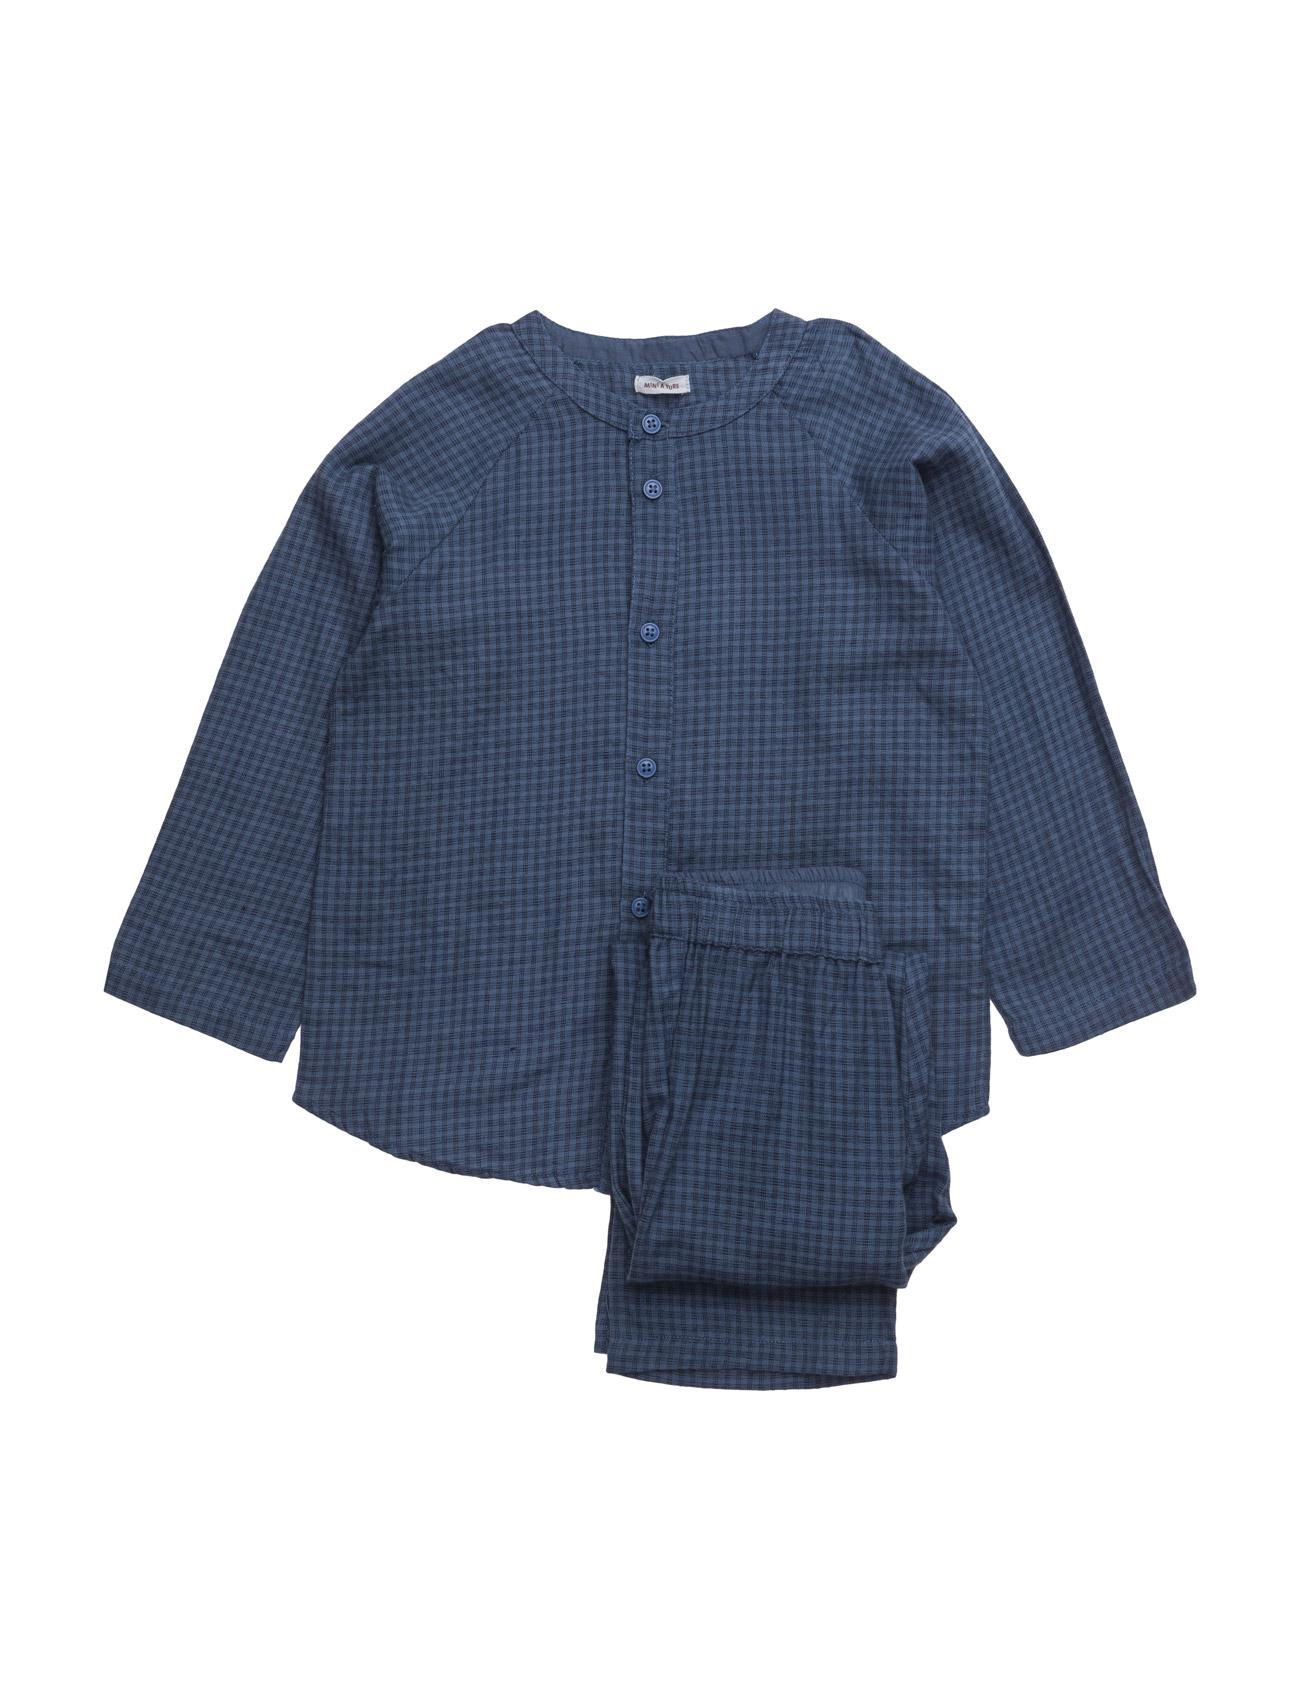 Paco Playwear Mini A Ture Pyjamas til Børn i